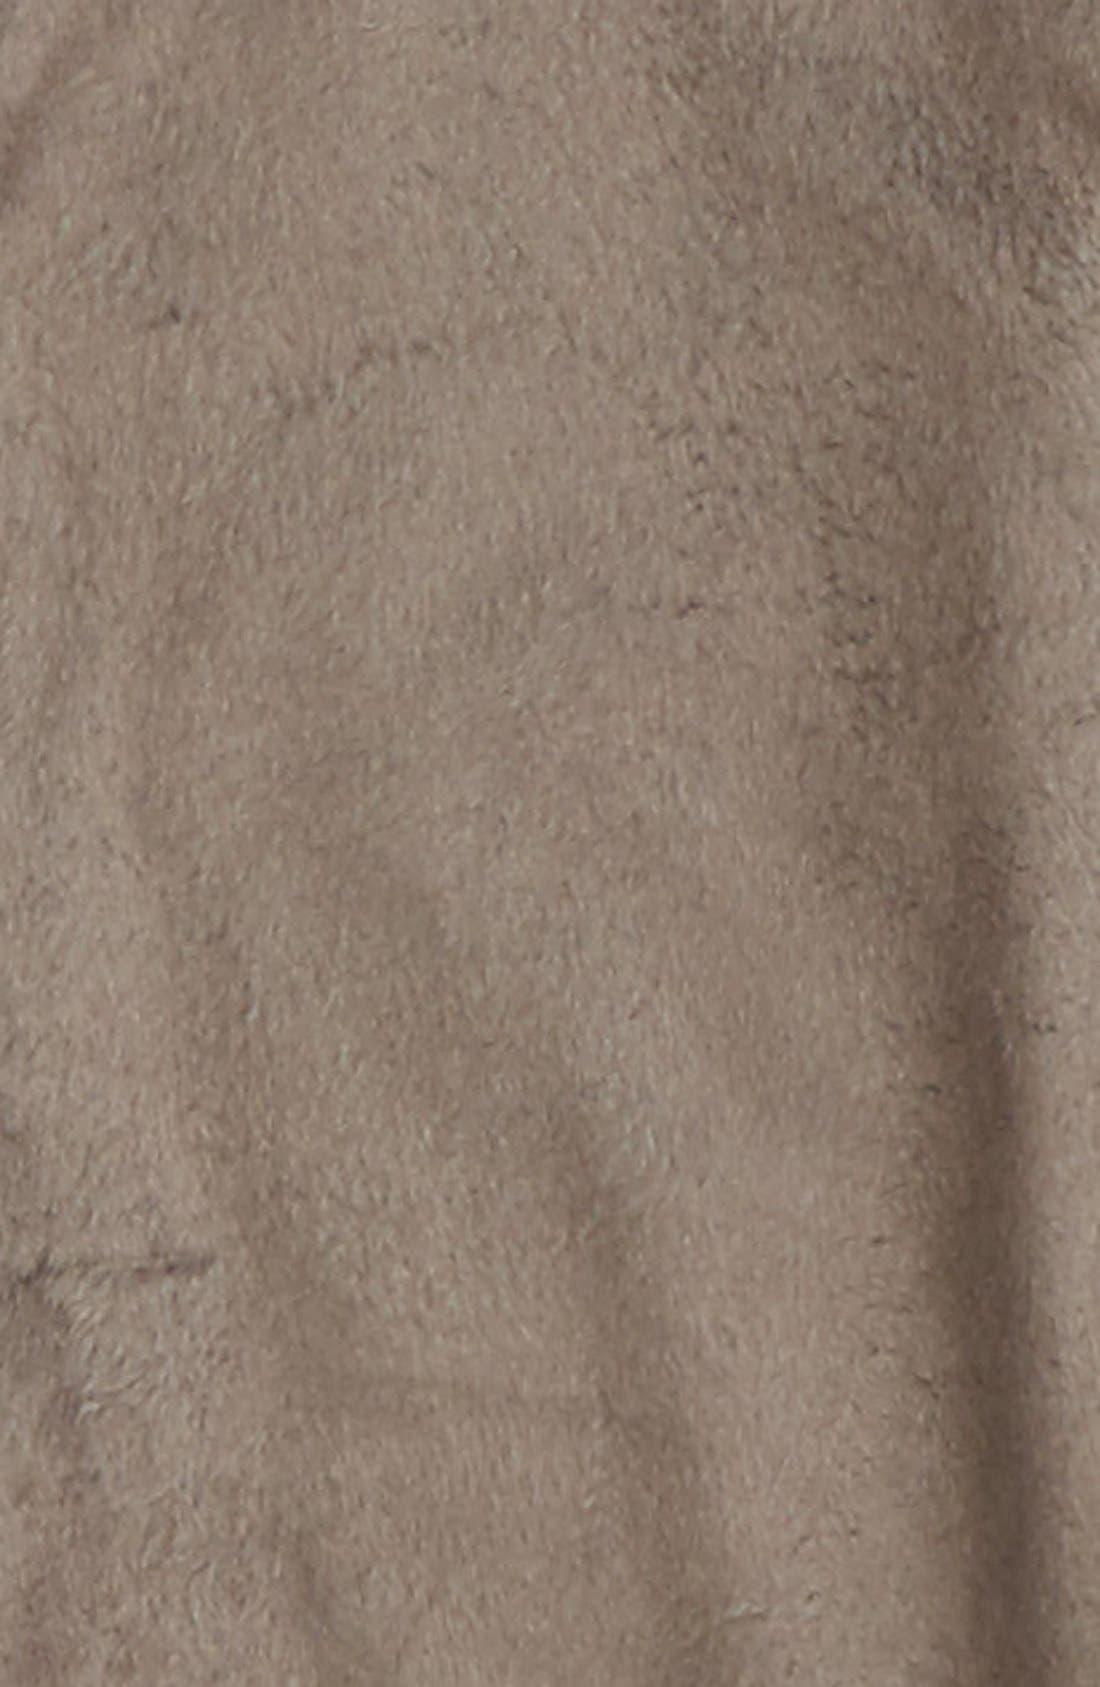 Alternate Image 2  - PJ Salvage Deer Fitted One-Piece Pajamas (Little Girls & Big Girls)